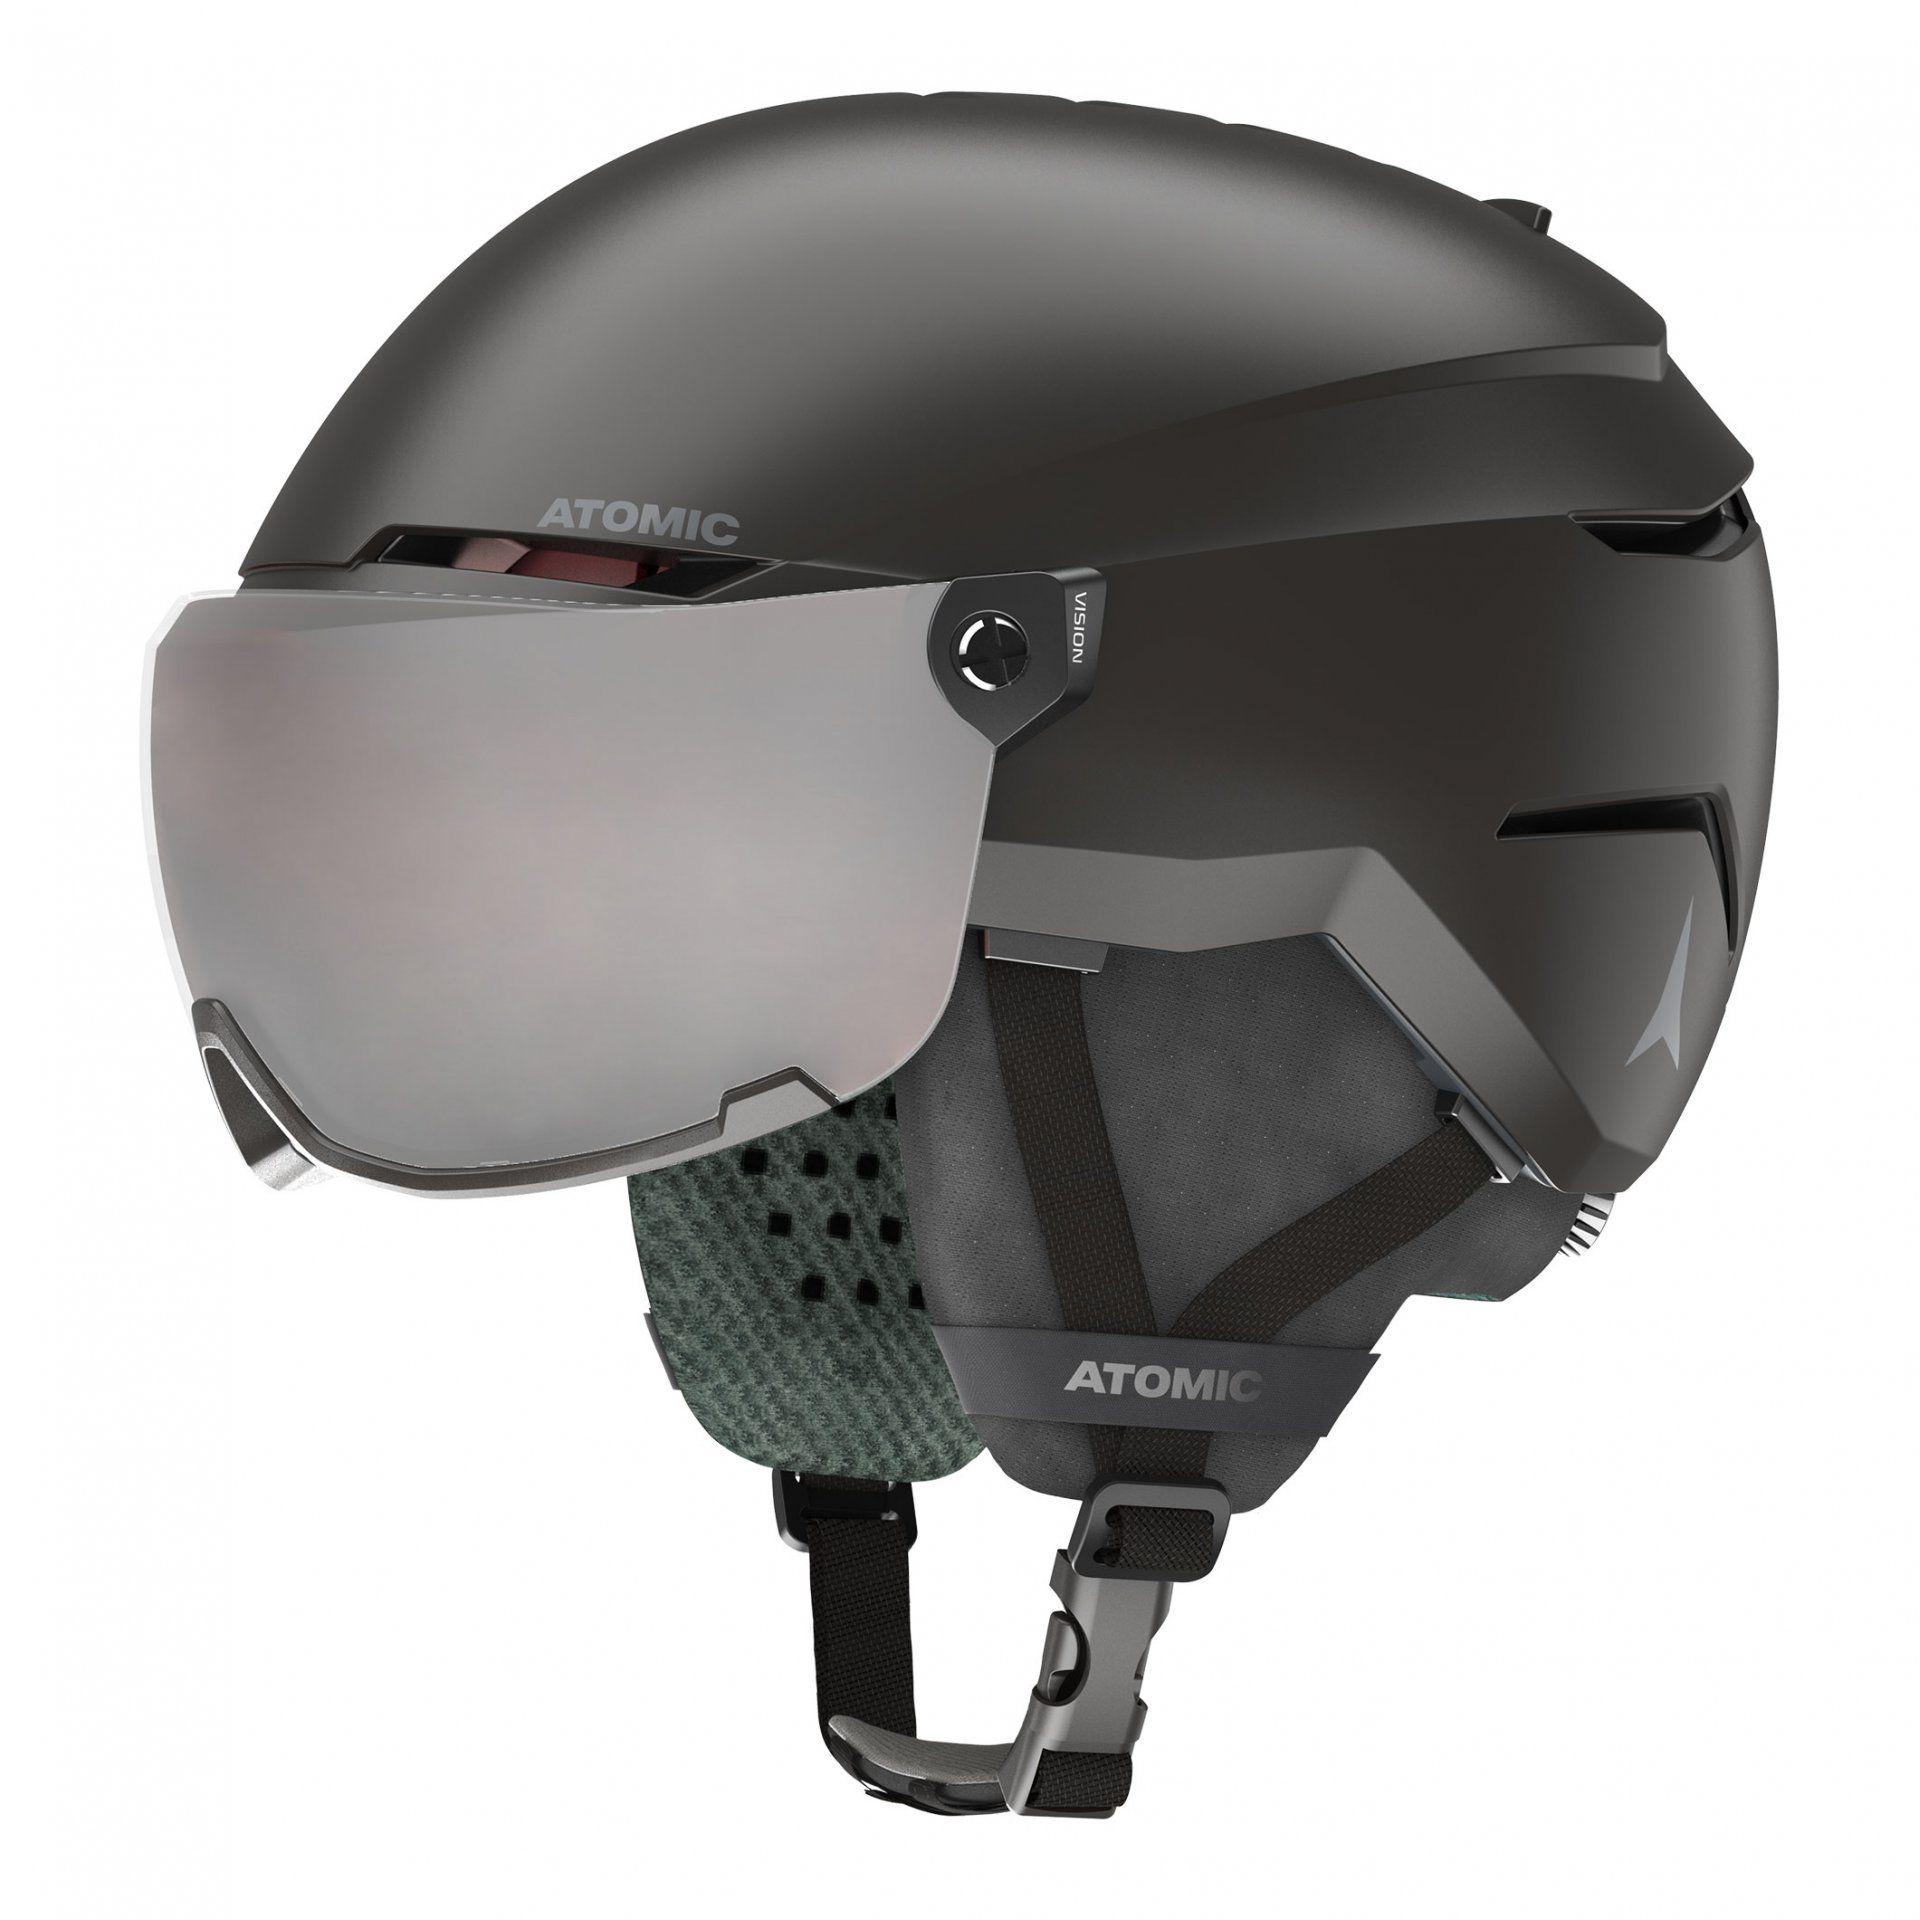 KASK ATOMIC SAVOR VISOR JR BLACK AN5005888